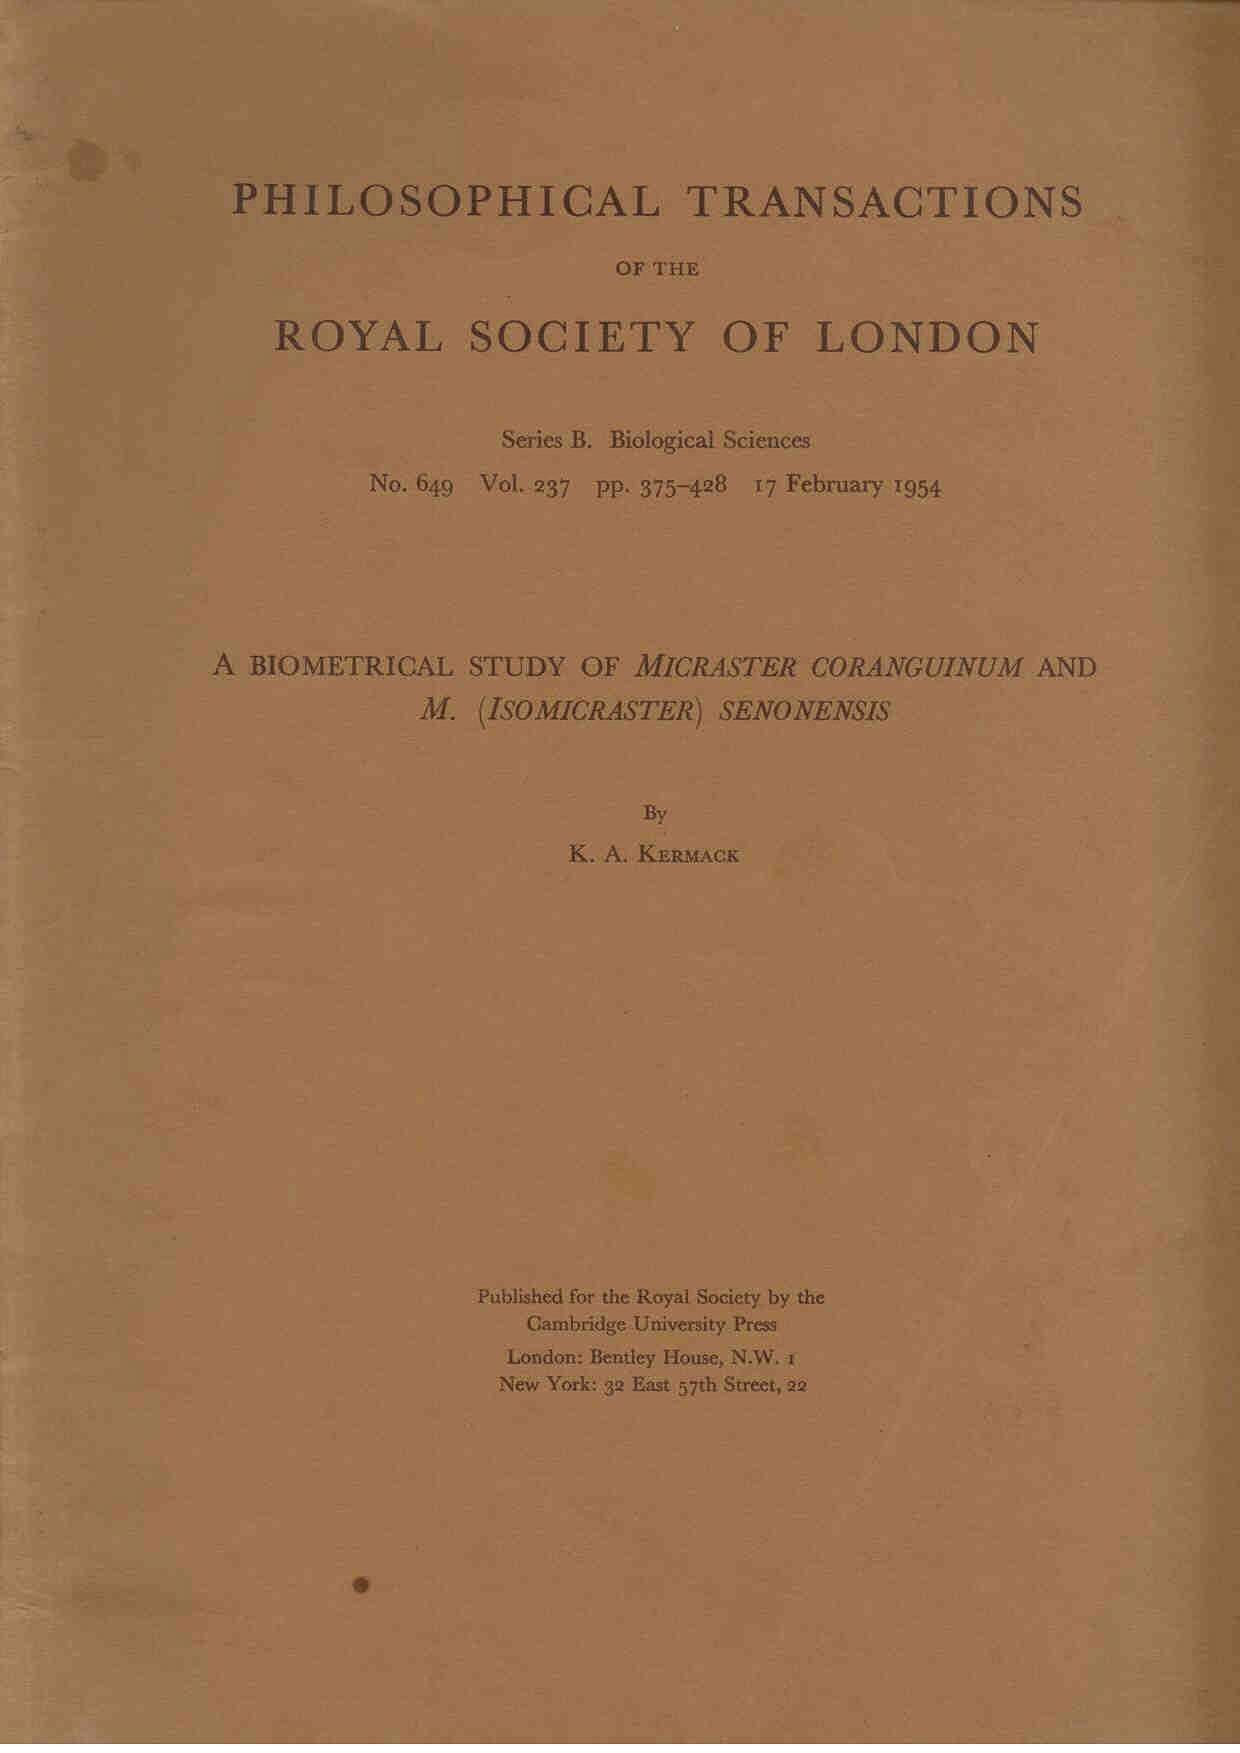 Kermack, K. A.:  A biometrical study of Micraster coranguinum and M. (Isomicraster) senonensis.